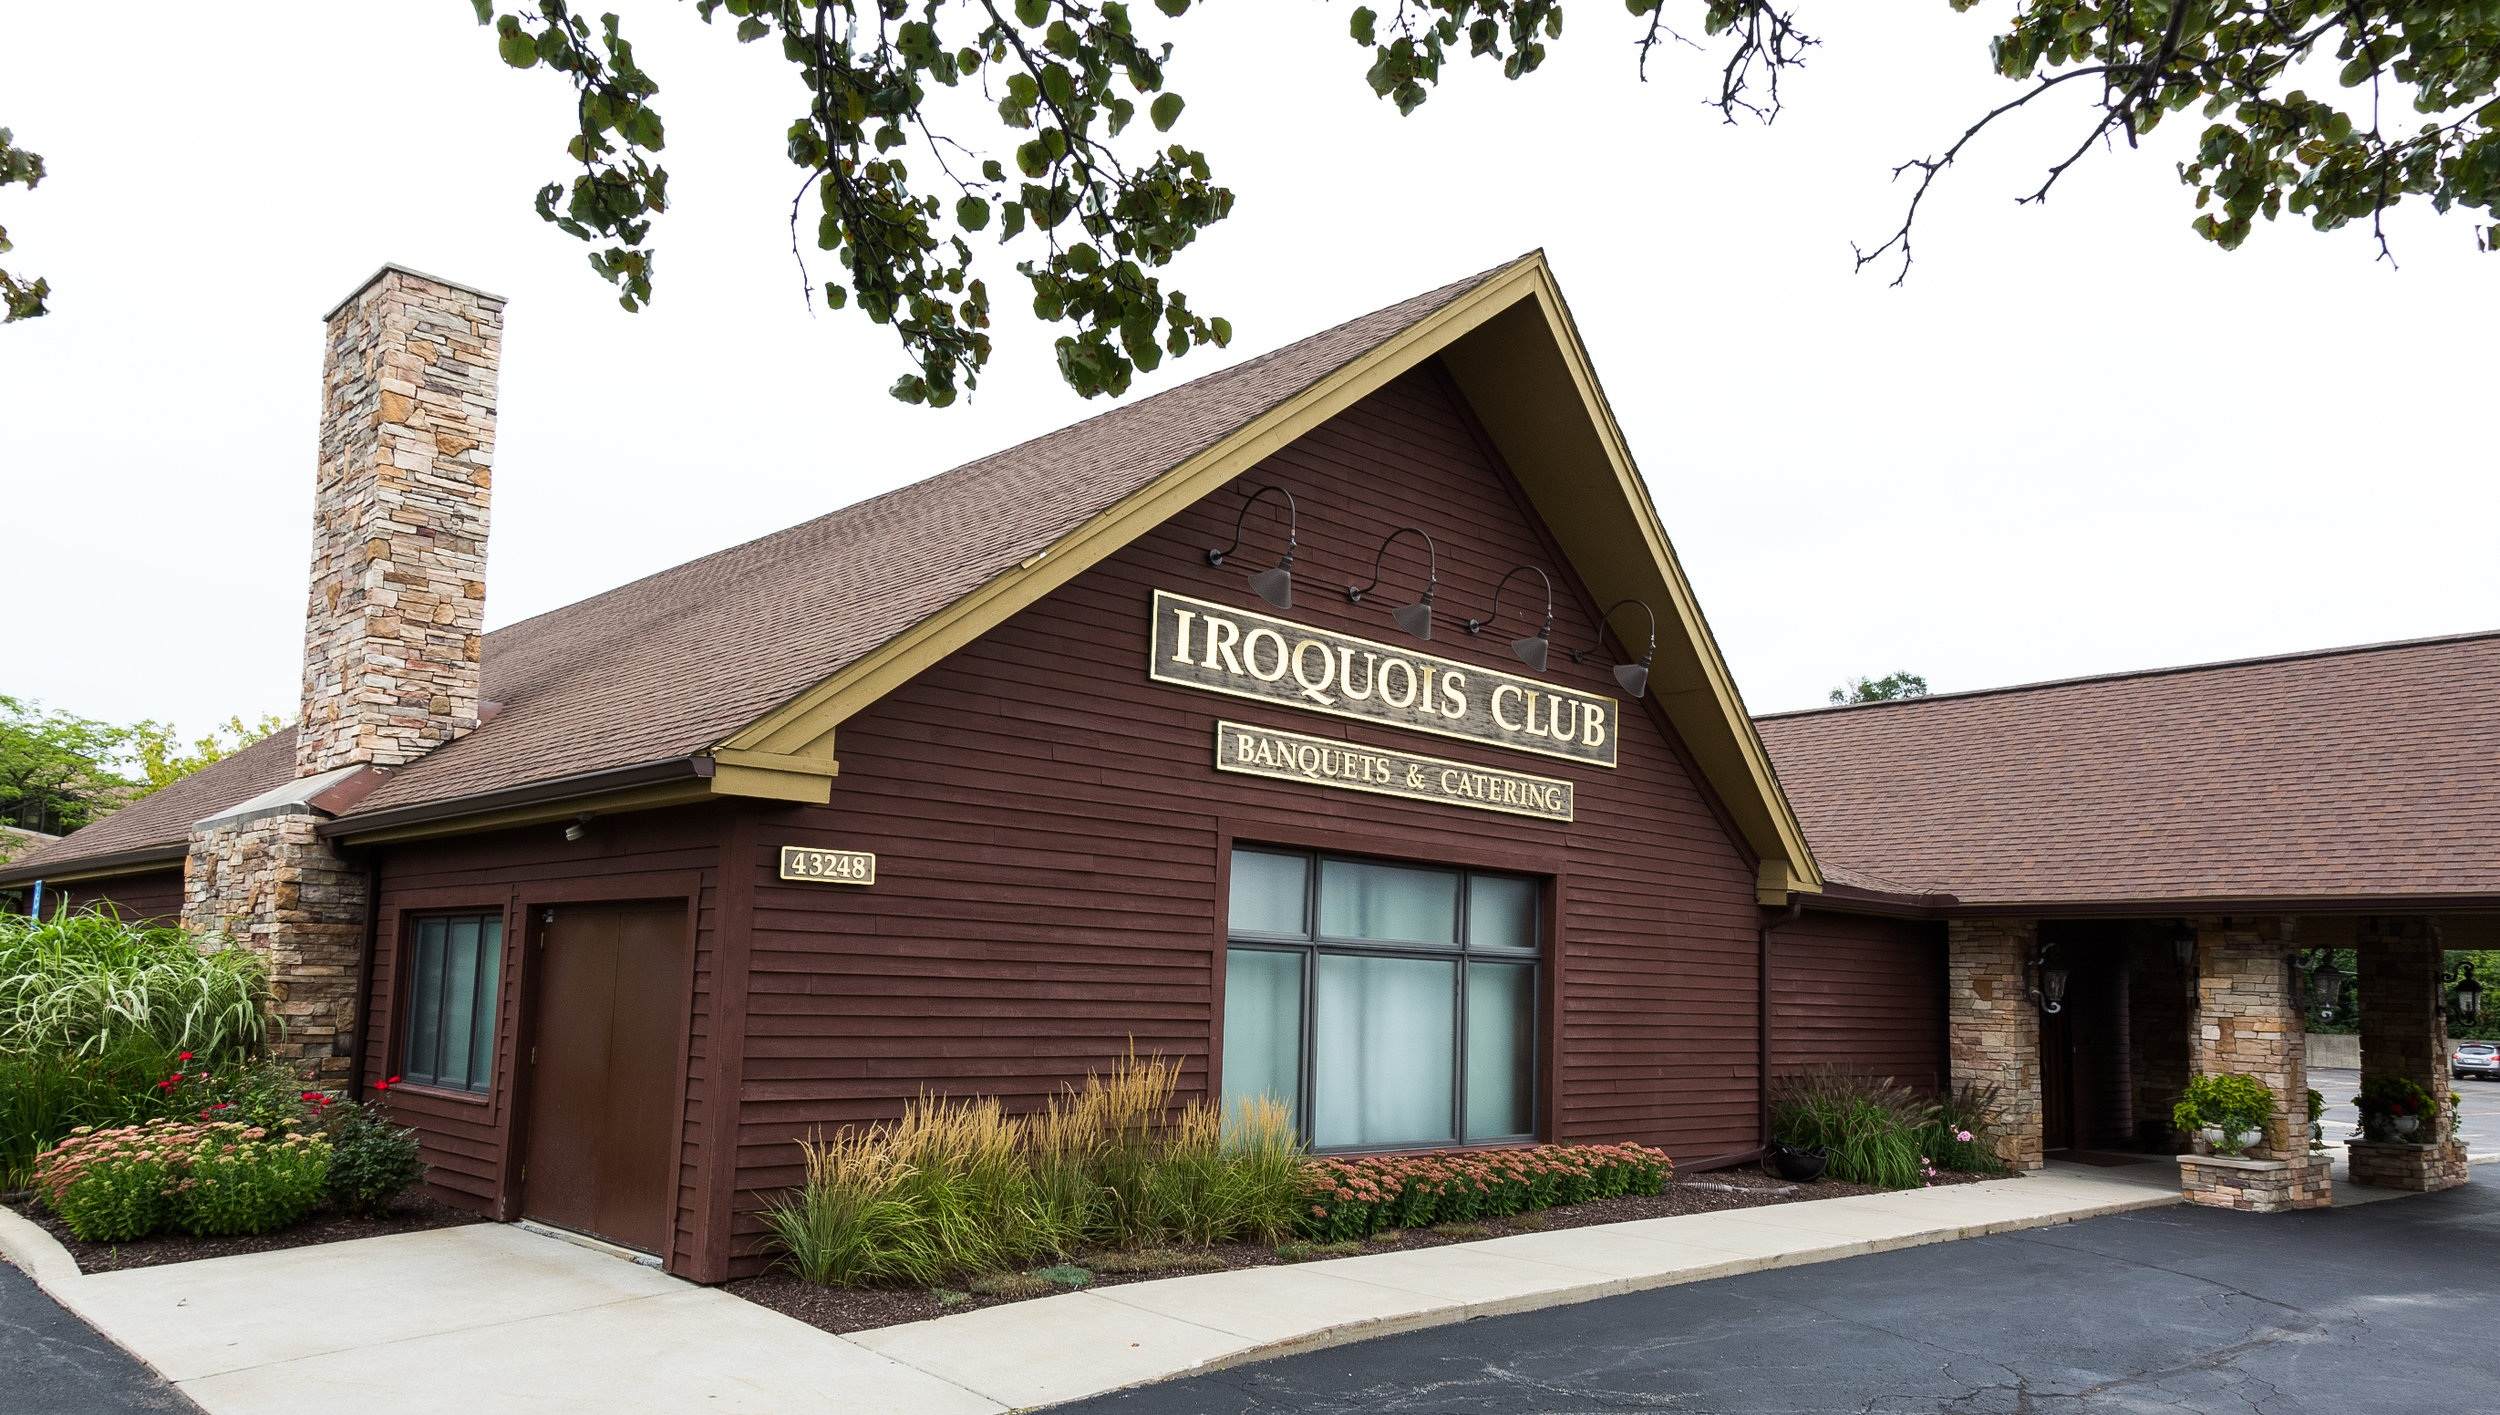 The Iroquois Club   Bloomfield Hills Michigan